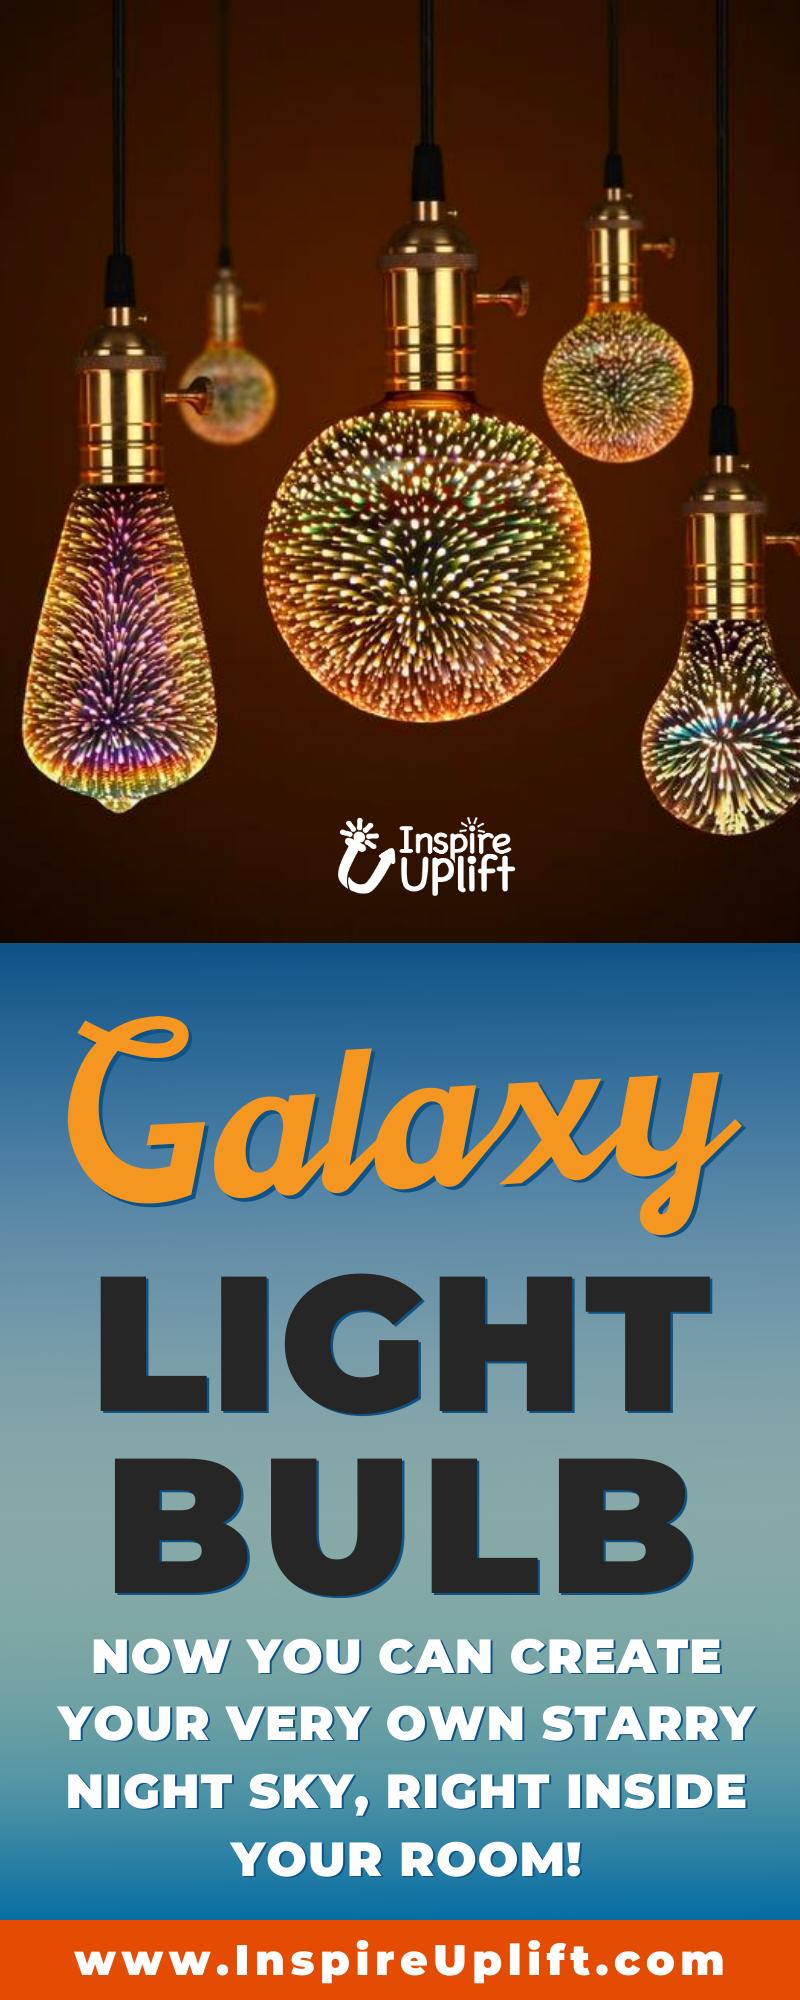 Galaxy Light Bulb Gluhlampe Kuche Dekoration Lampen